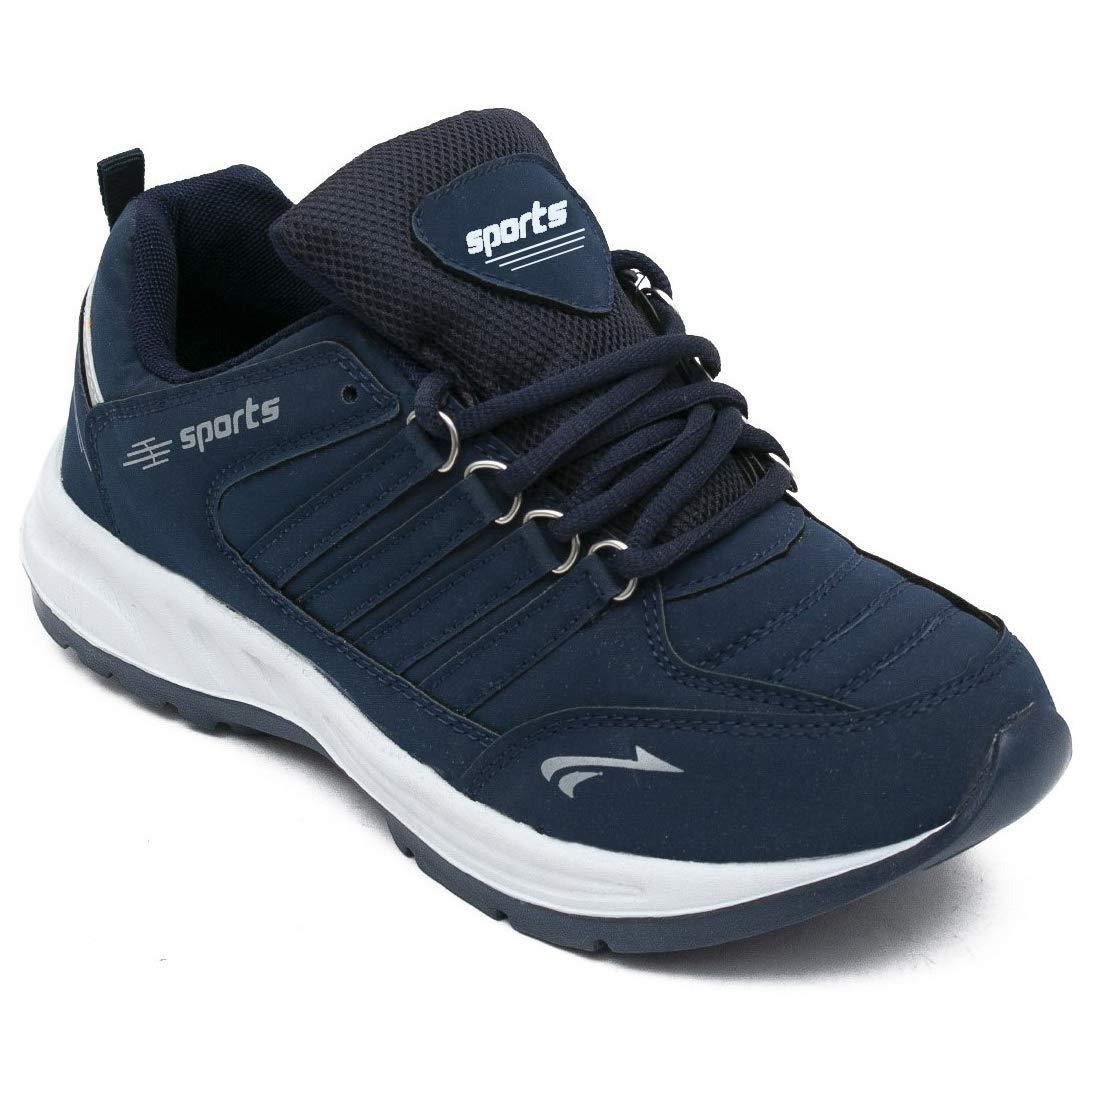 Running Road | Wode los hombres | Footwear | The Clymb